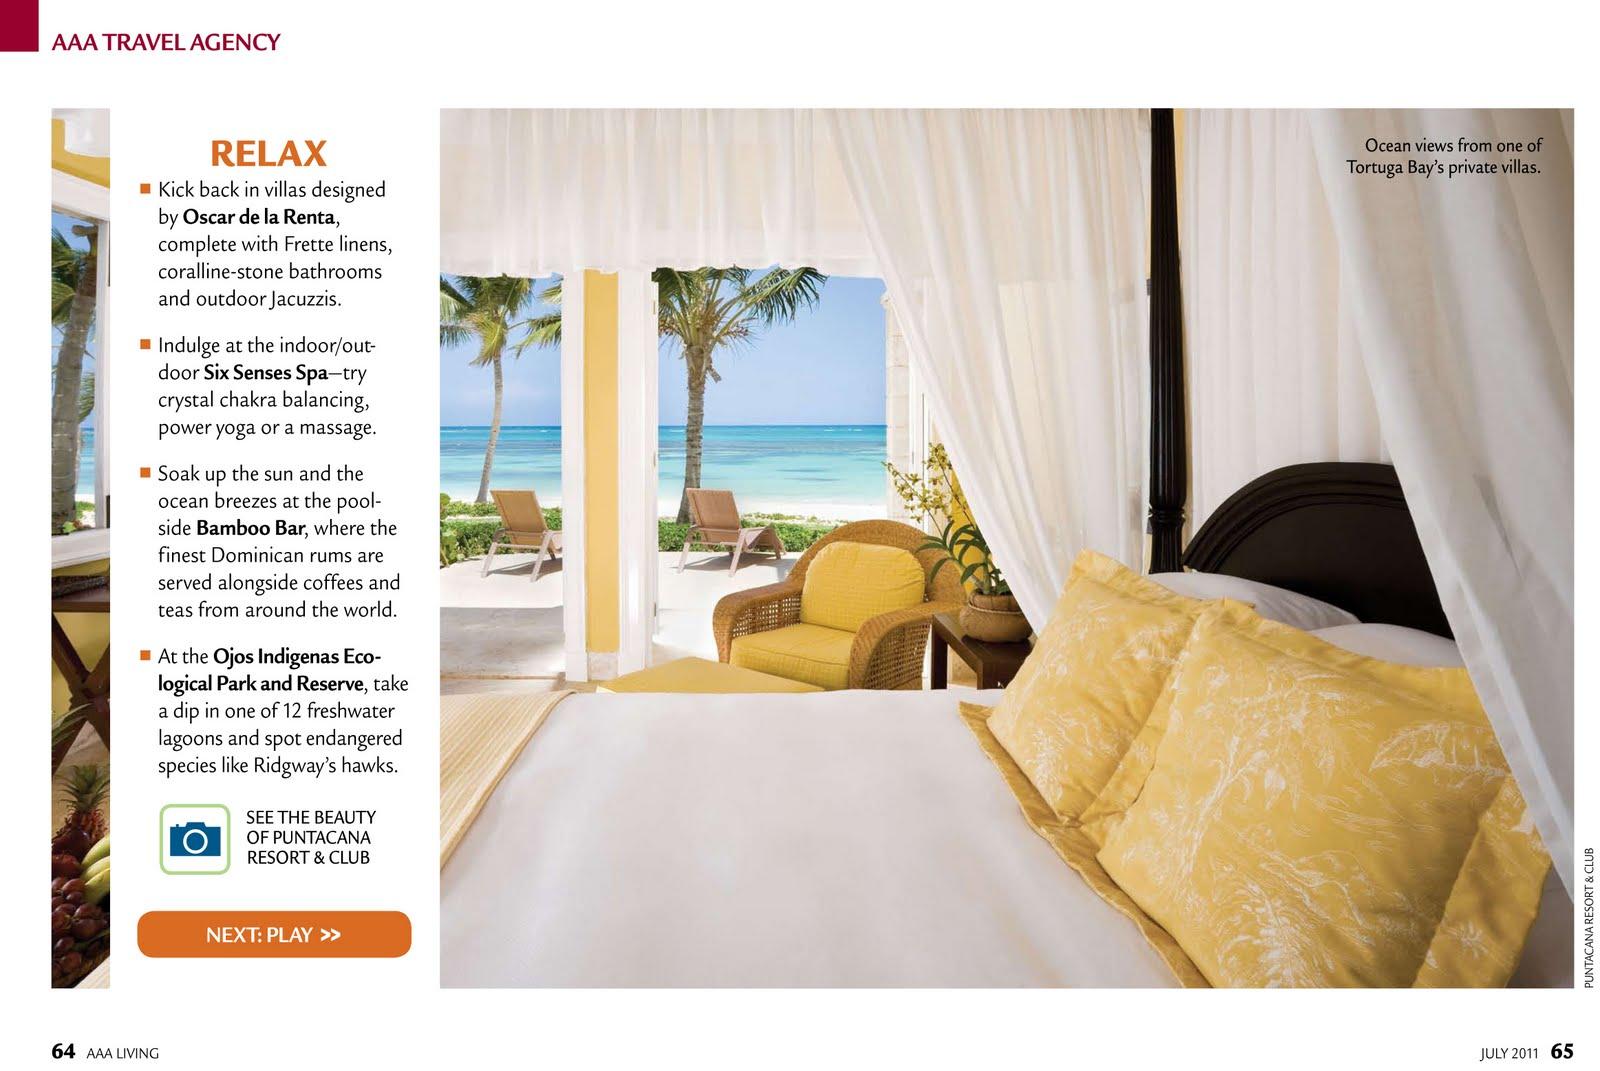 Dunk Island Holidays: AAA TRAVEL AGENCY: ESCAPE TO PARADISE